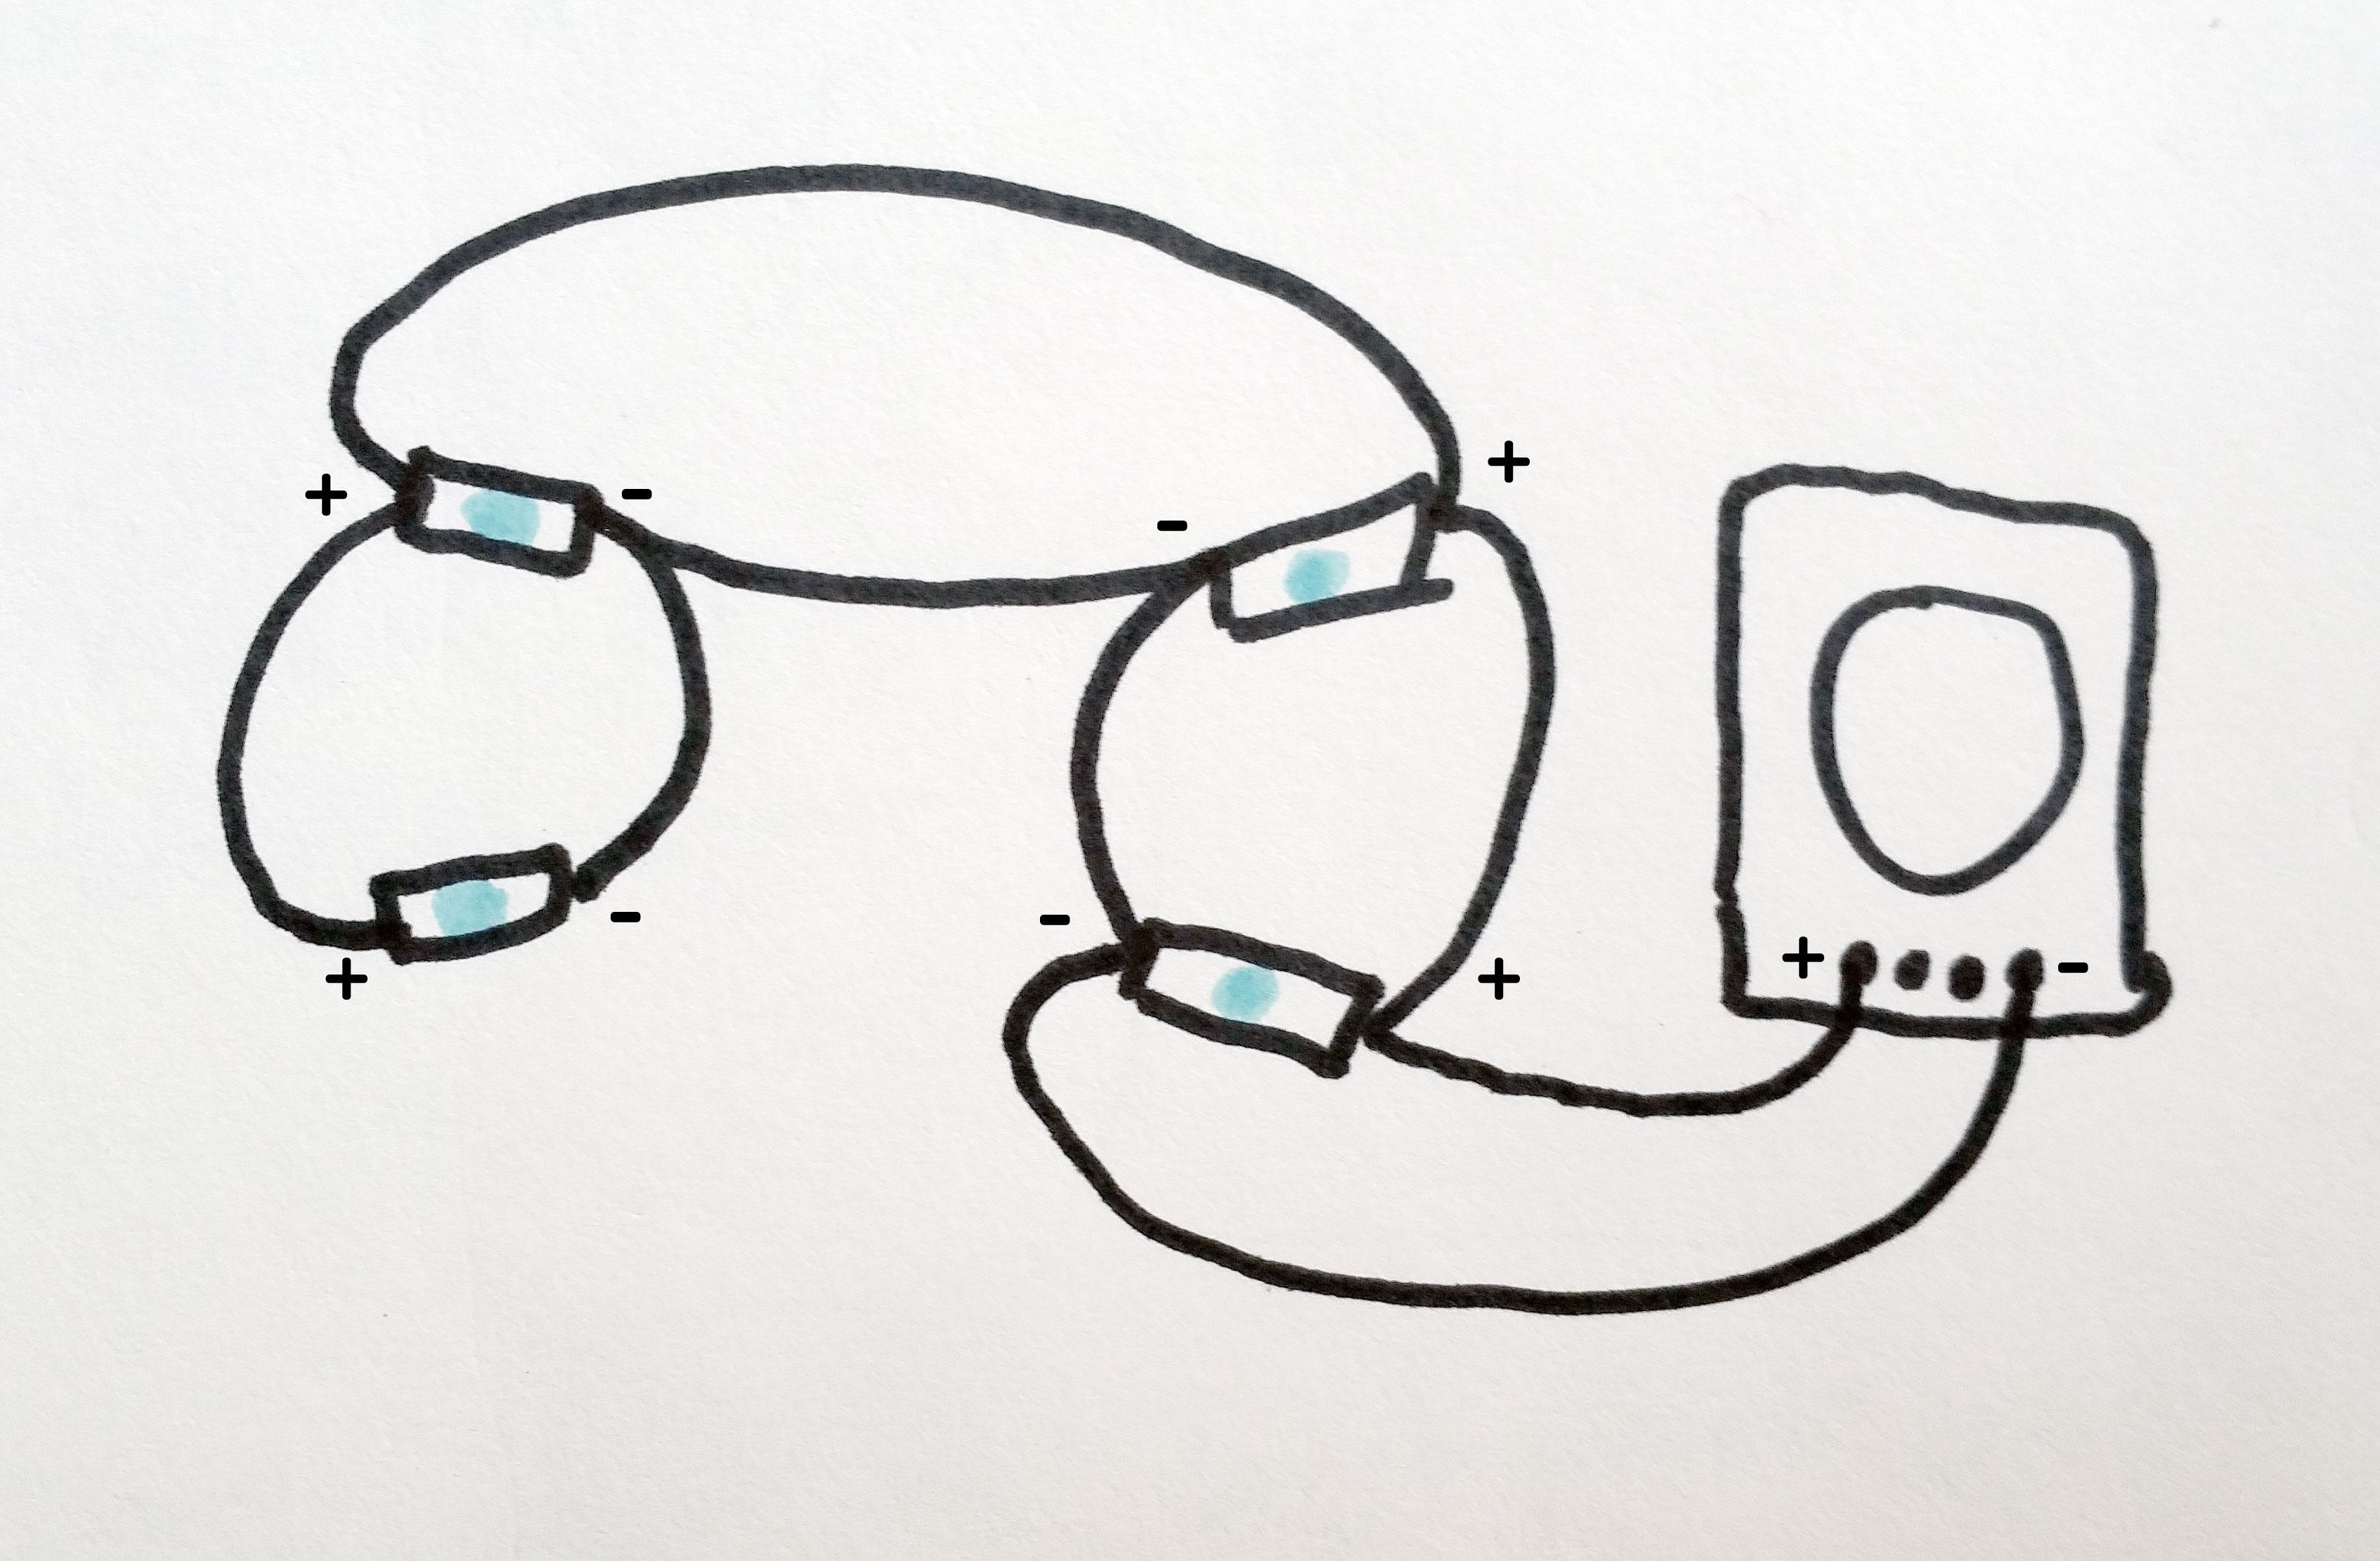 adafruit_products_circuit-diagram.jpg